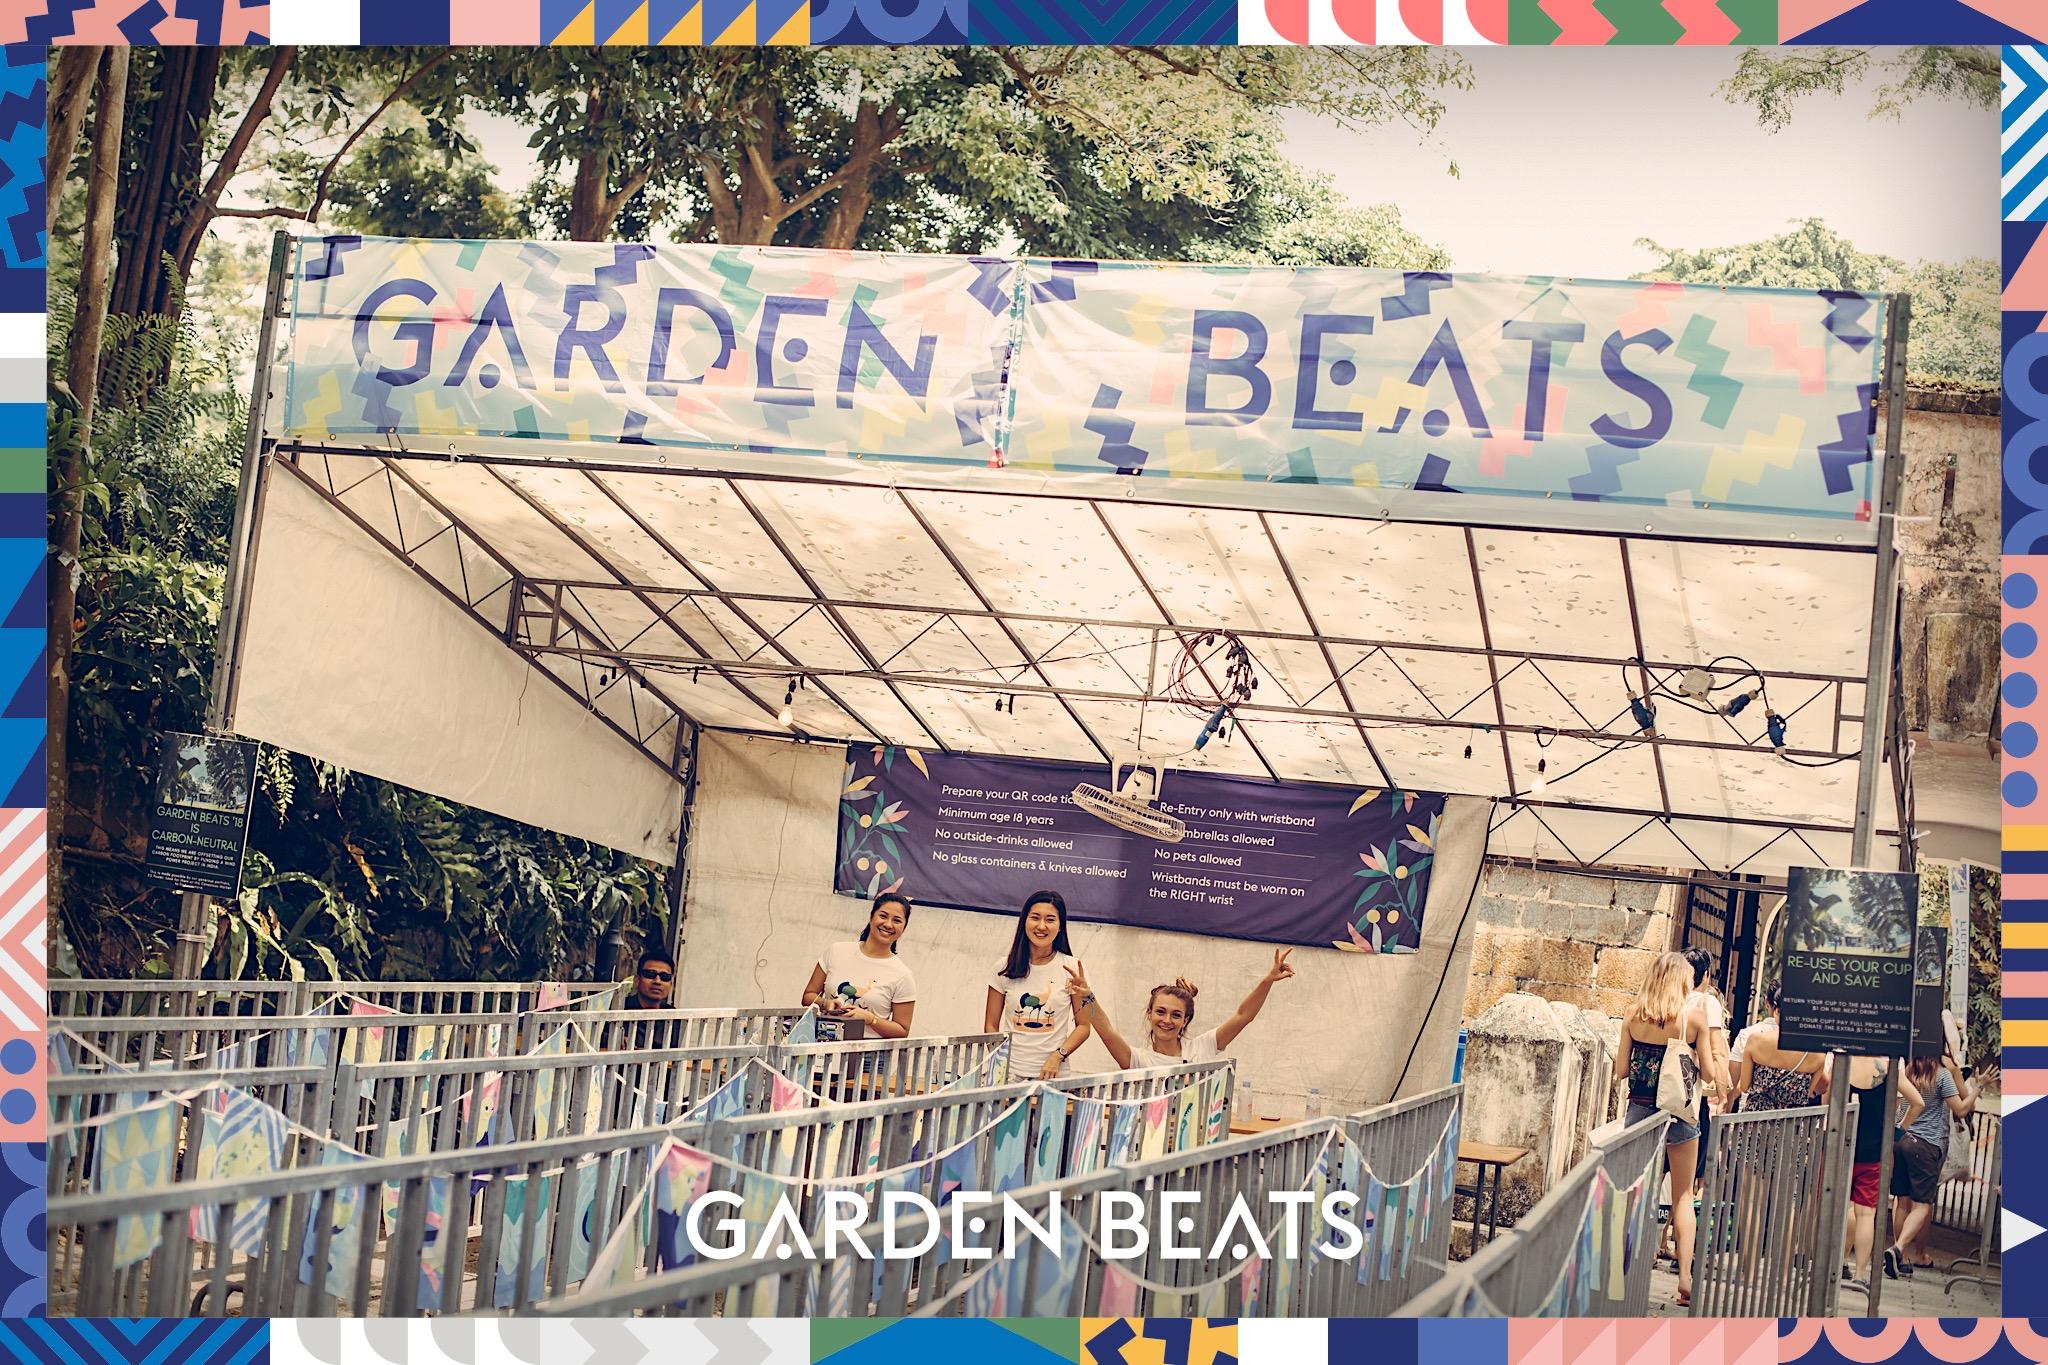 03032018_GardenBeats_Colossal061_Watermarked.jpg